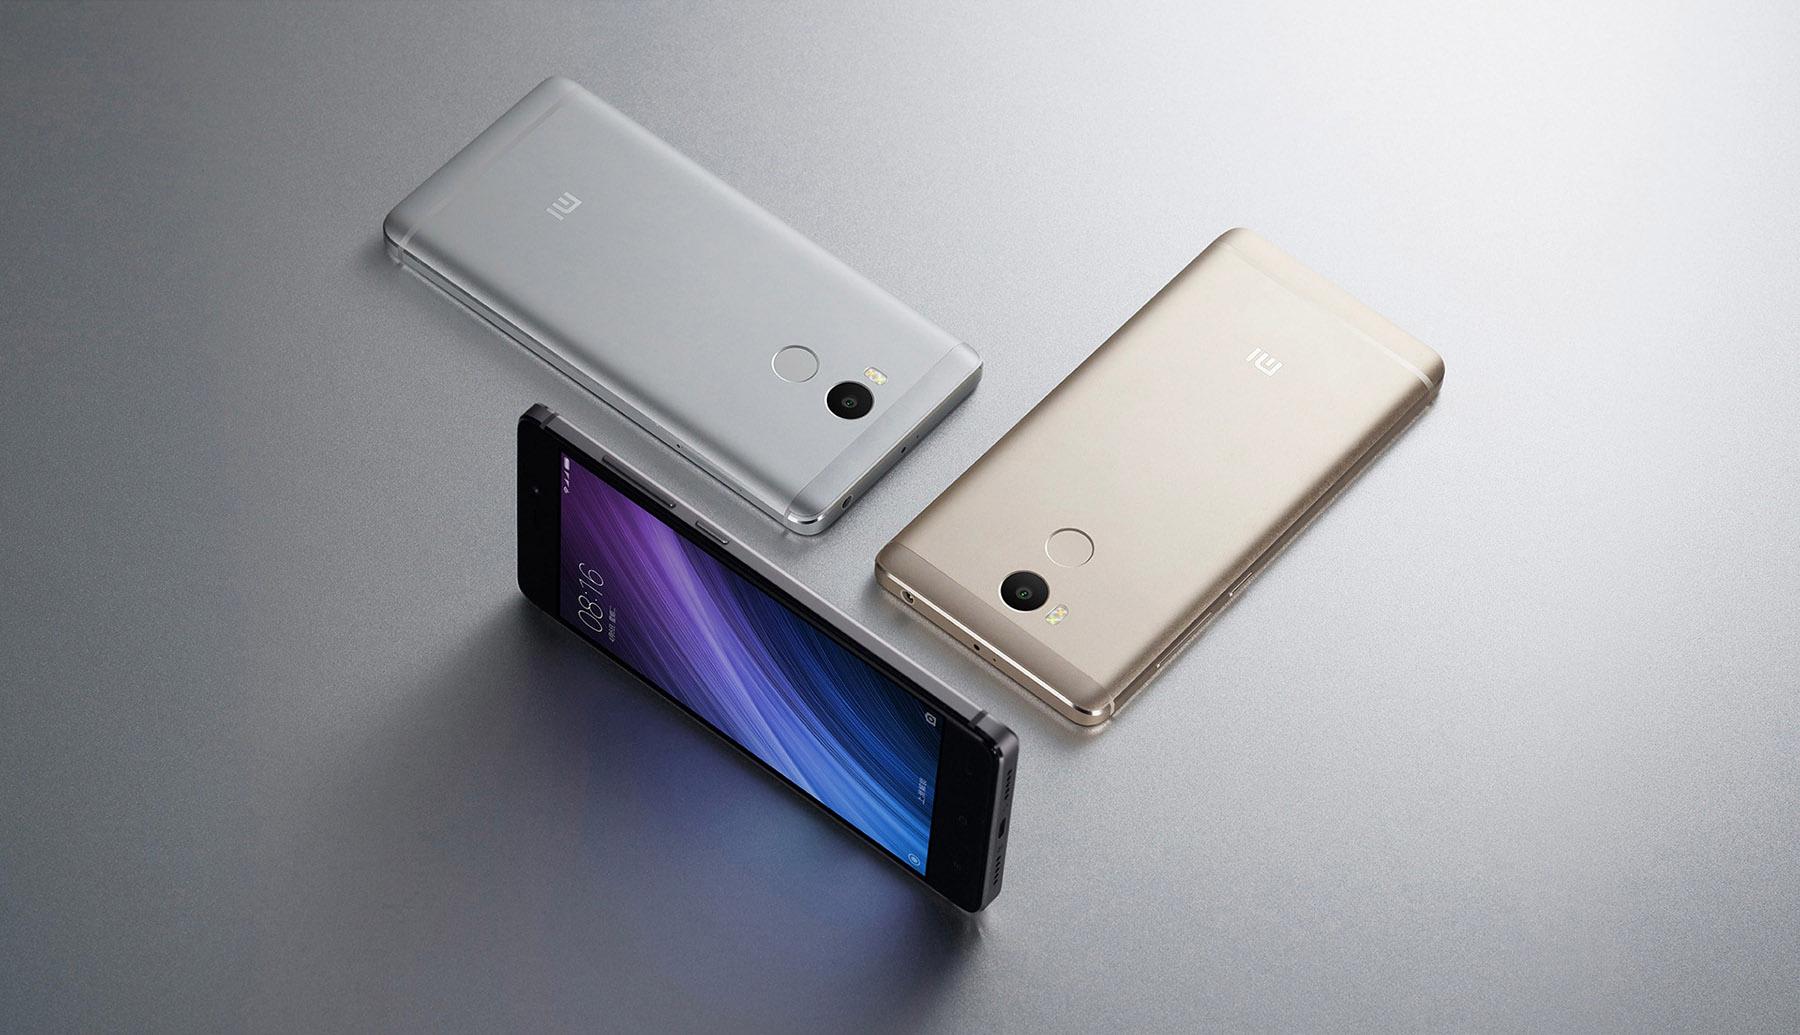 सबसे सस्ते 4G फ़ोन 2017 ke